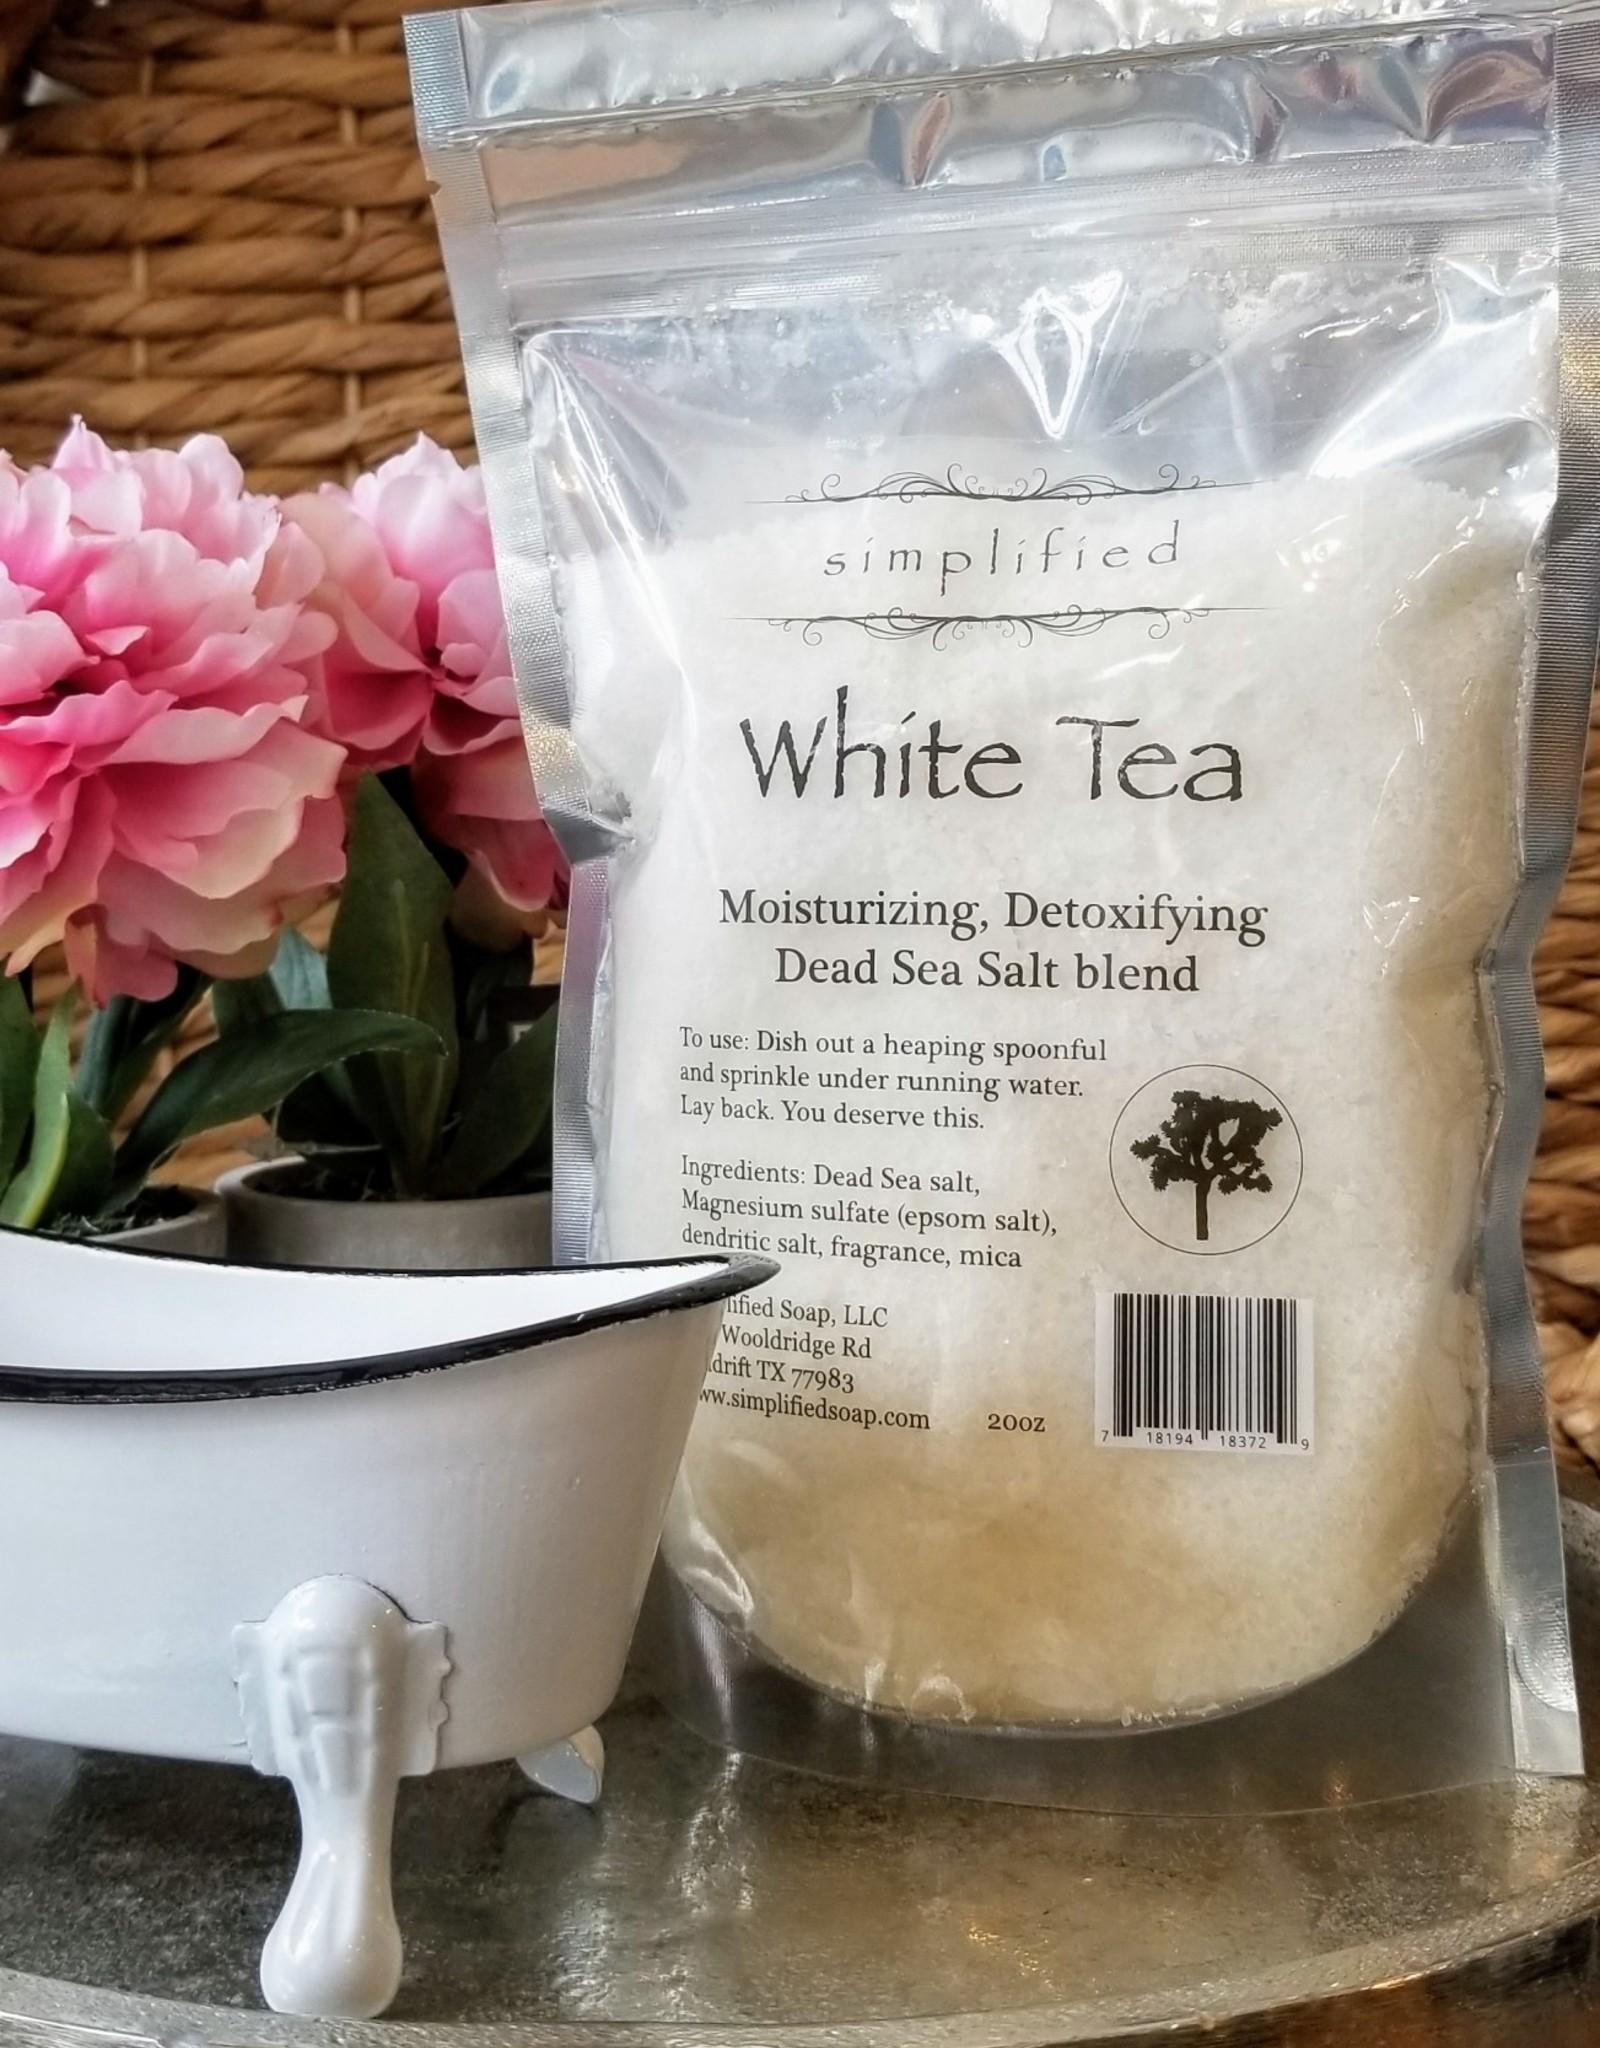 Simplified Soap Bath Salt Bag - White Tea